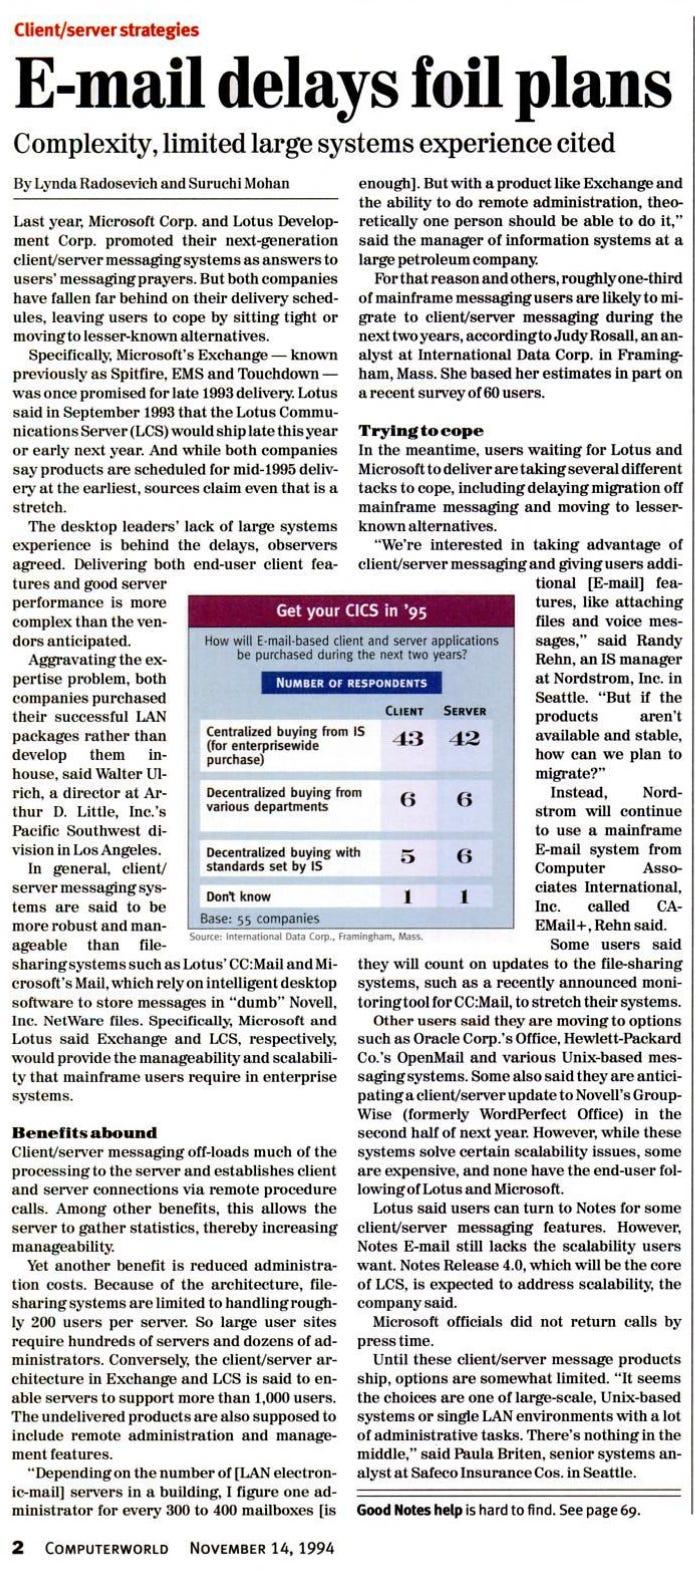 E-mail delays foil plans - headline from November 1994